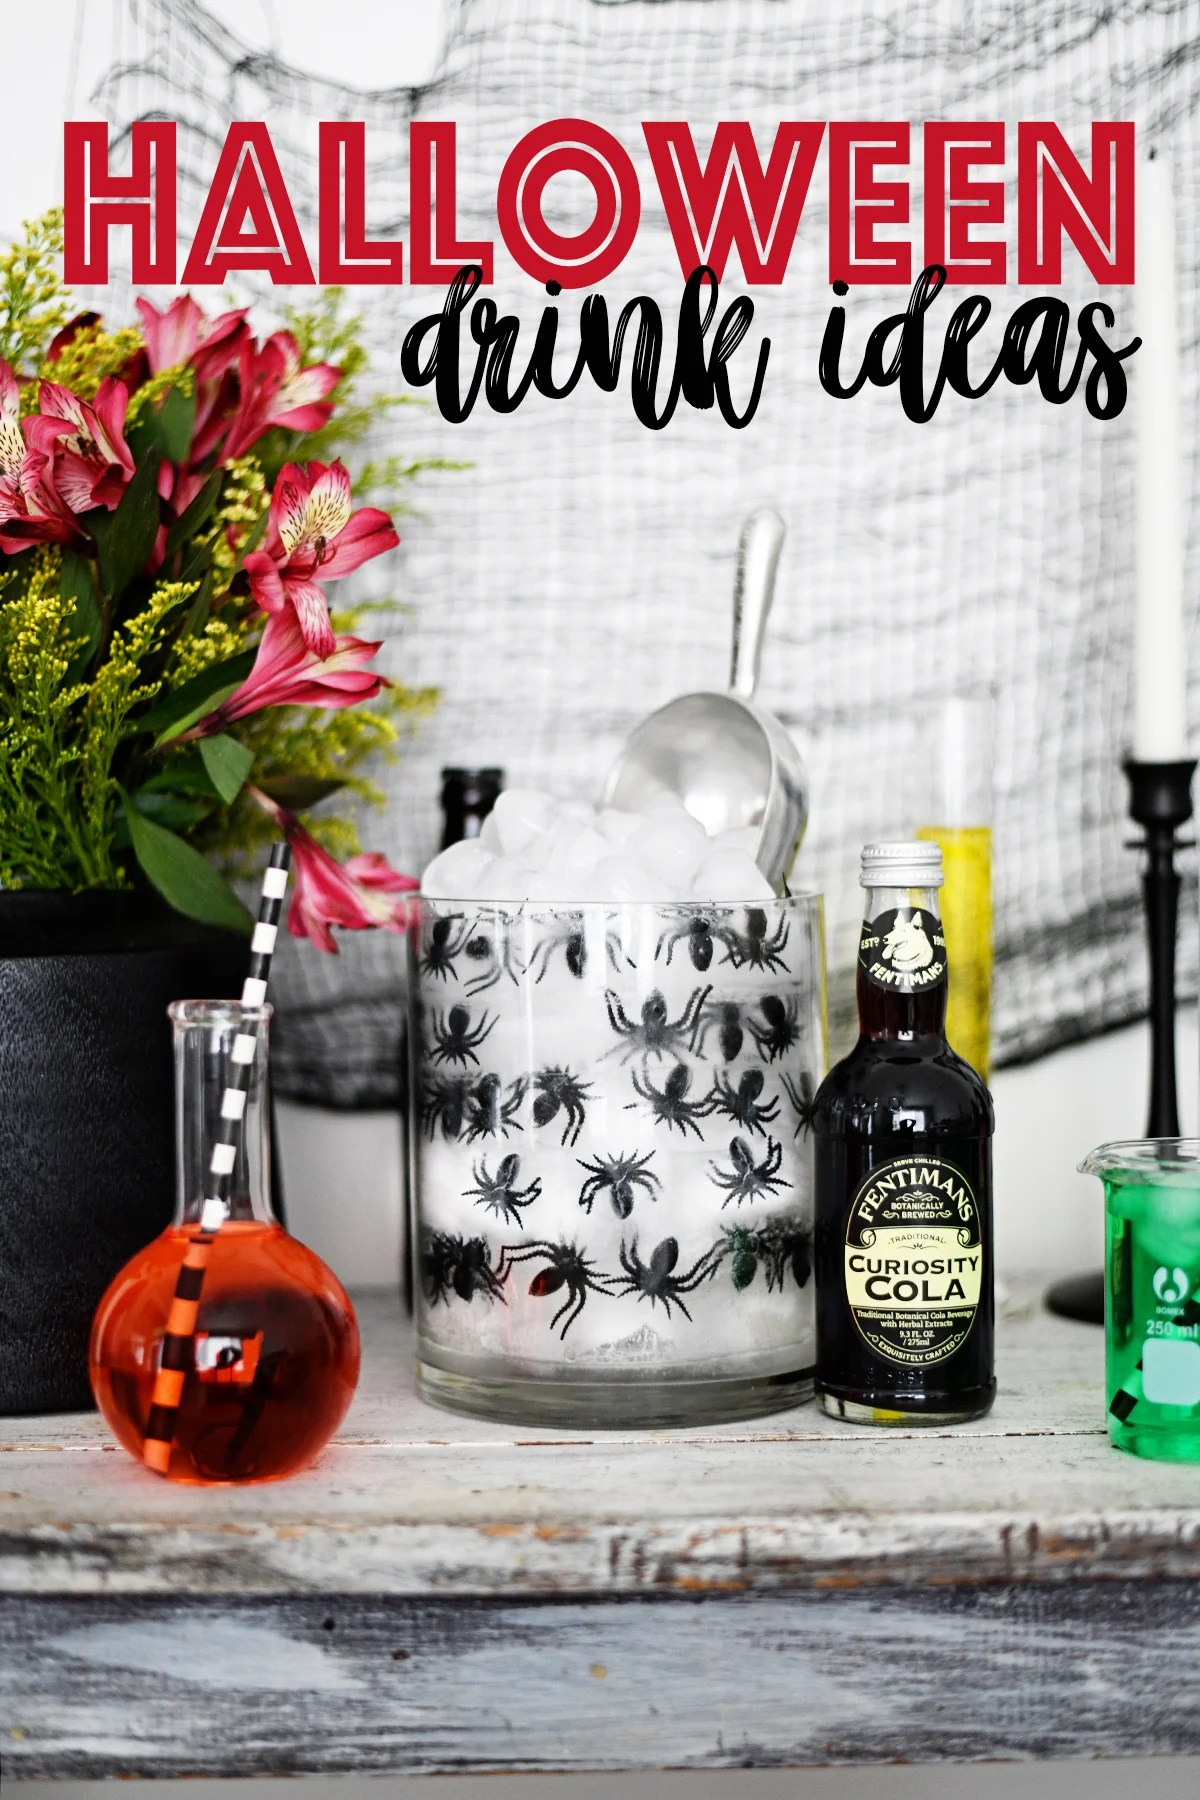 Halloween drink ideas for kids